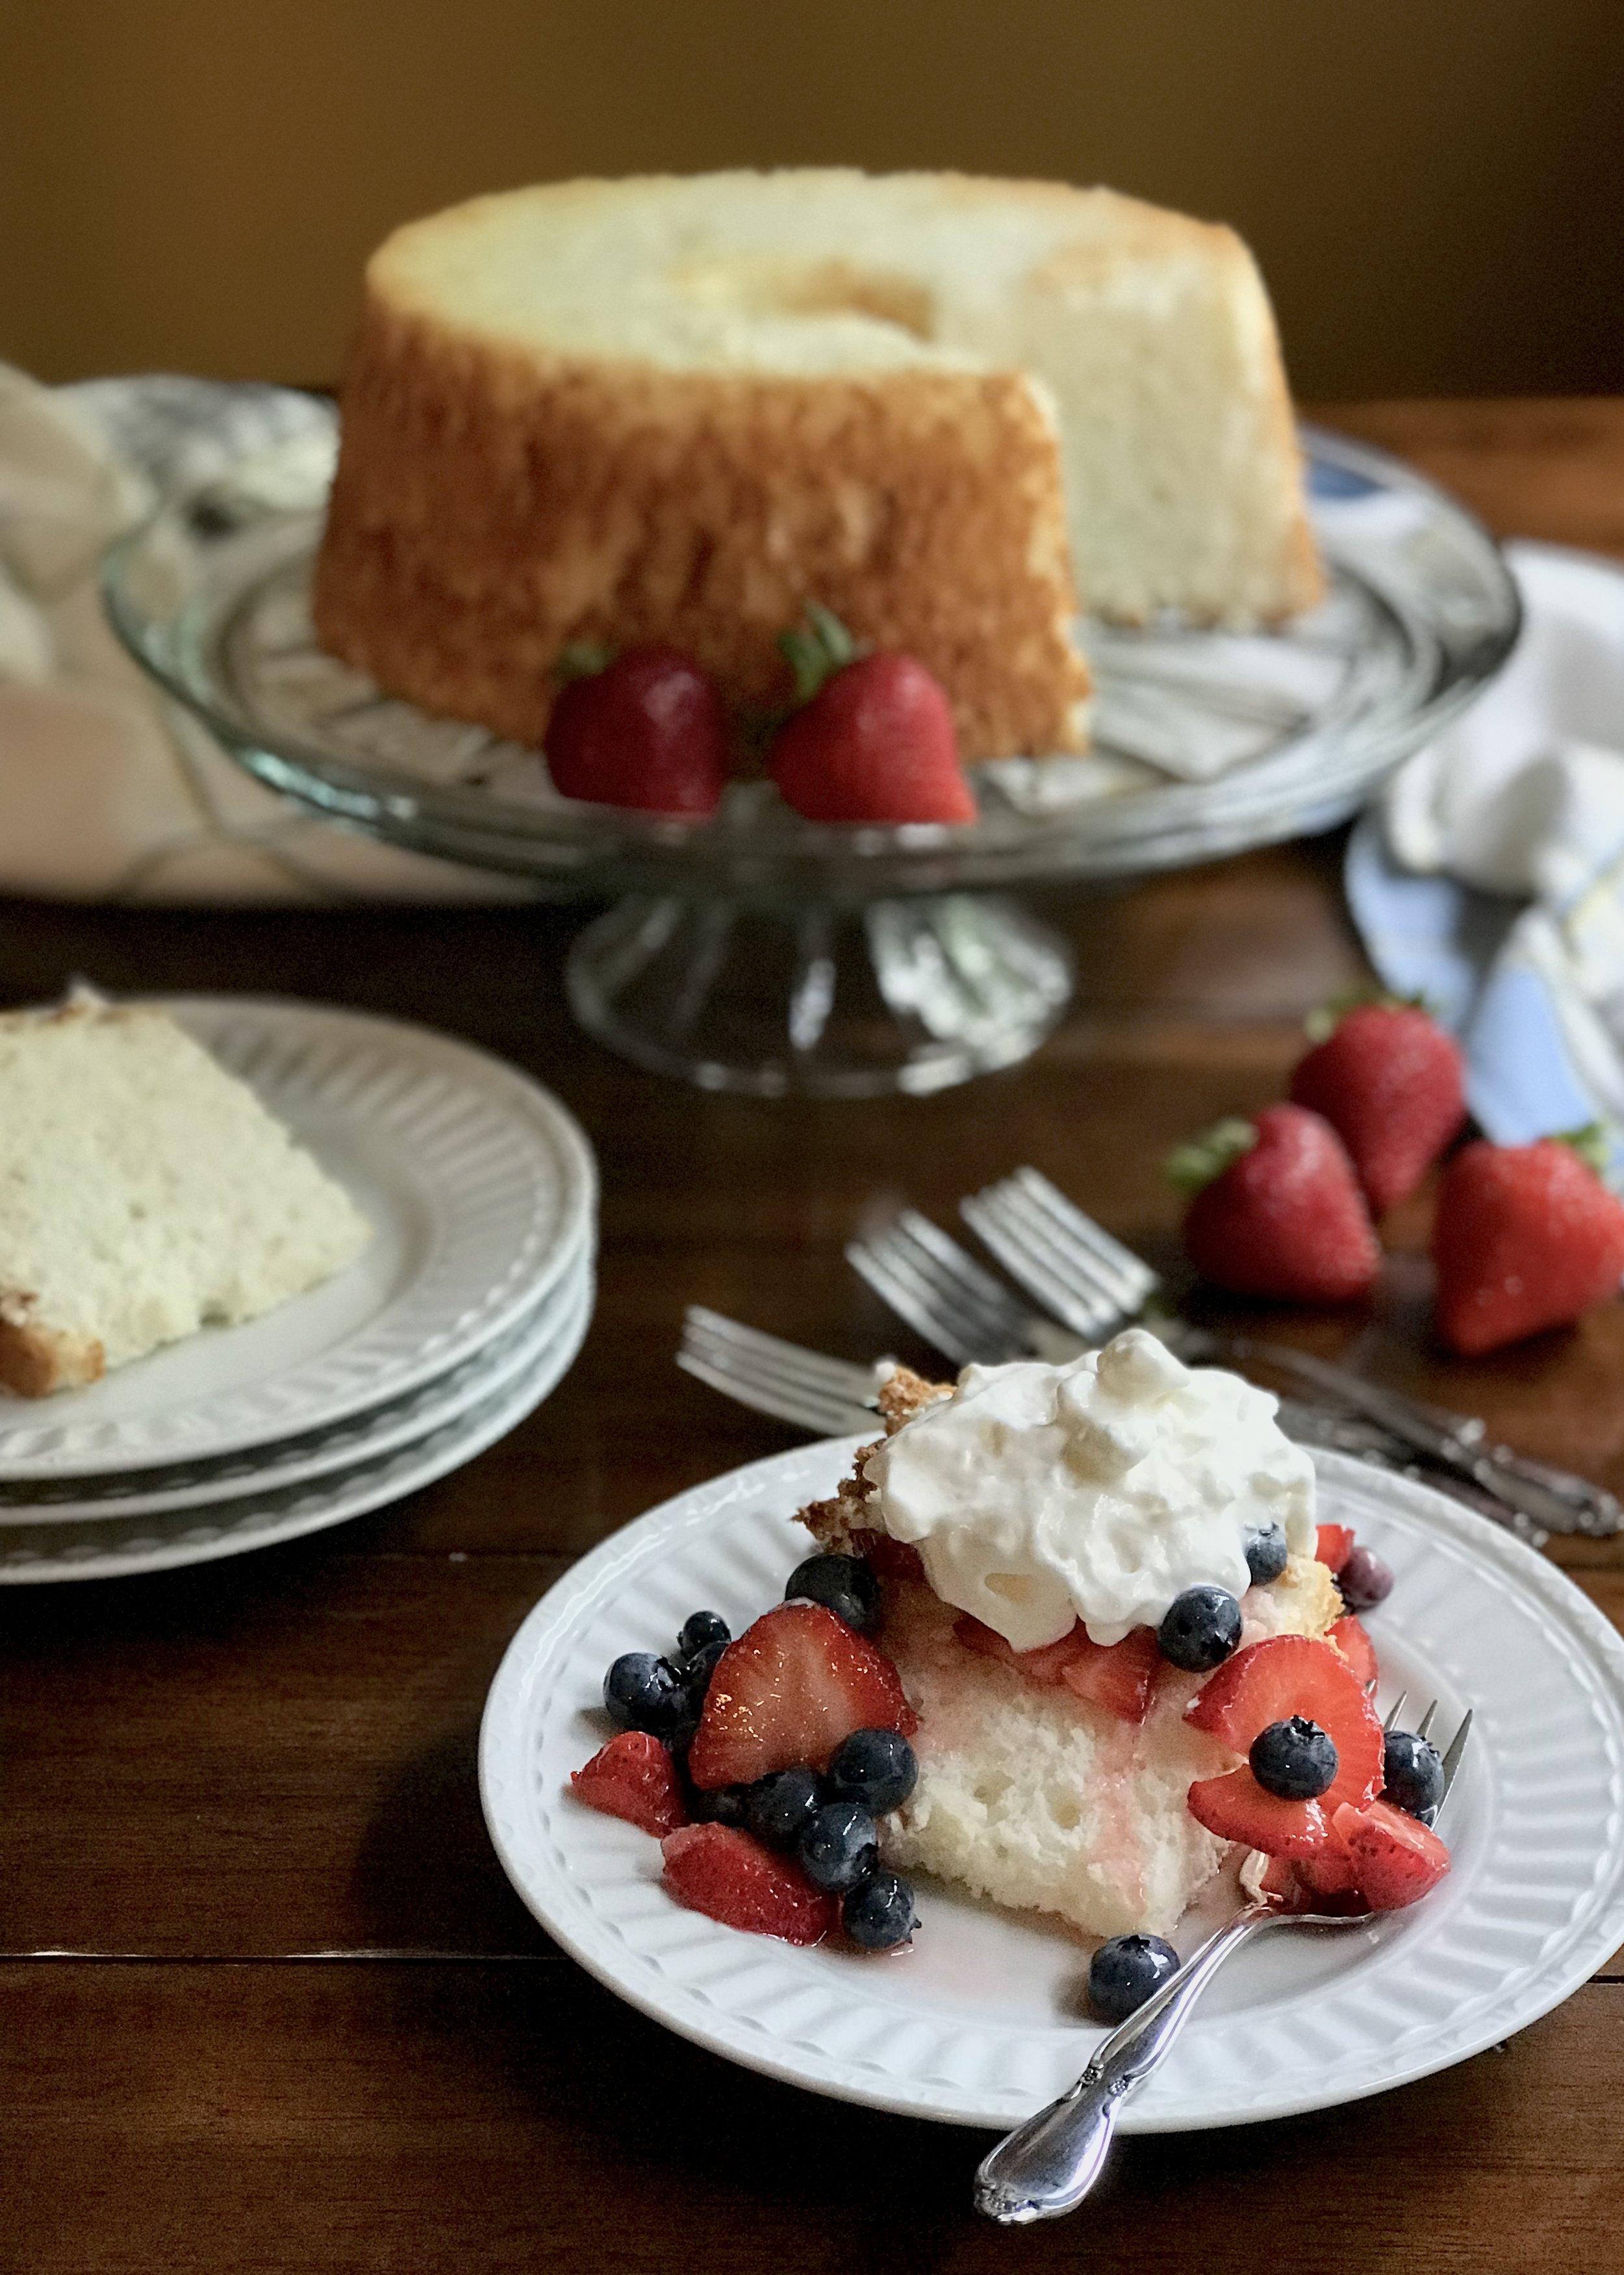 Heavenly Angel Food Cake recipe. Photo credit: Anita McVey